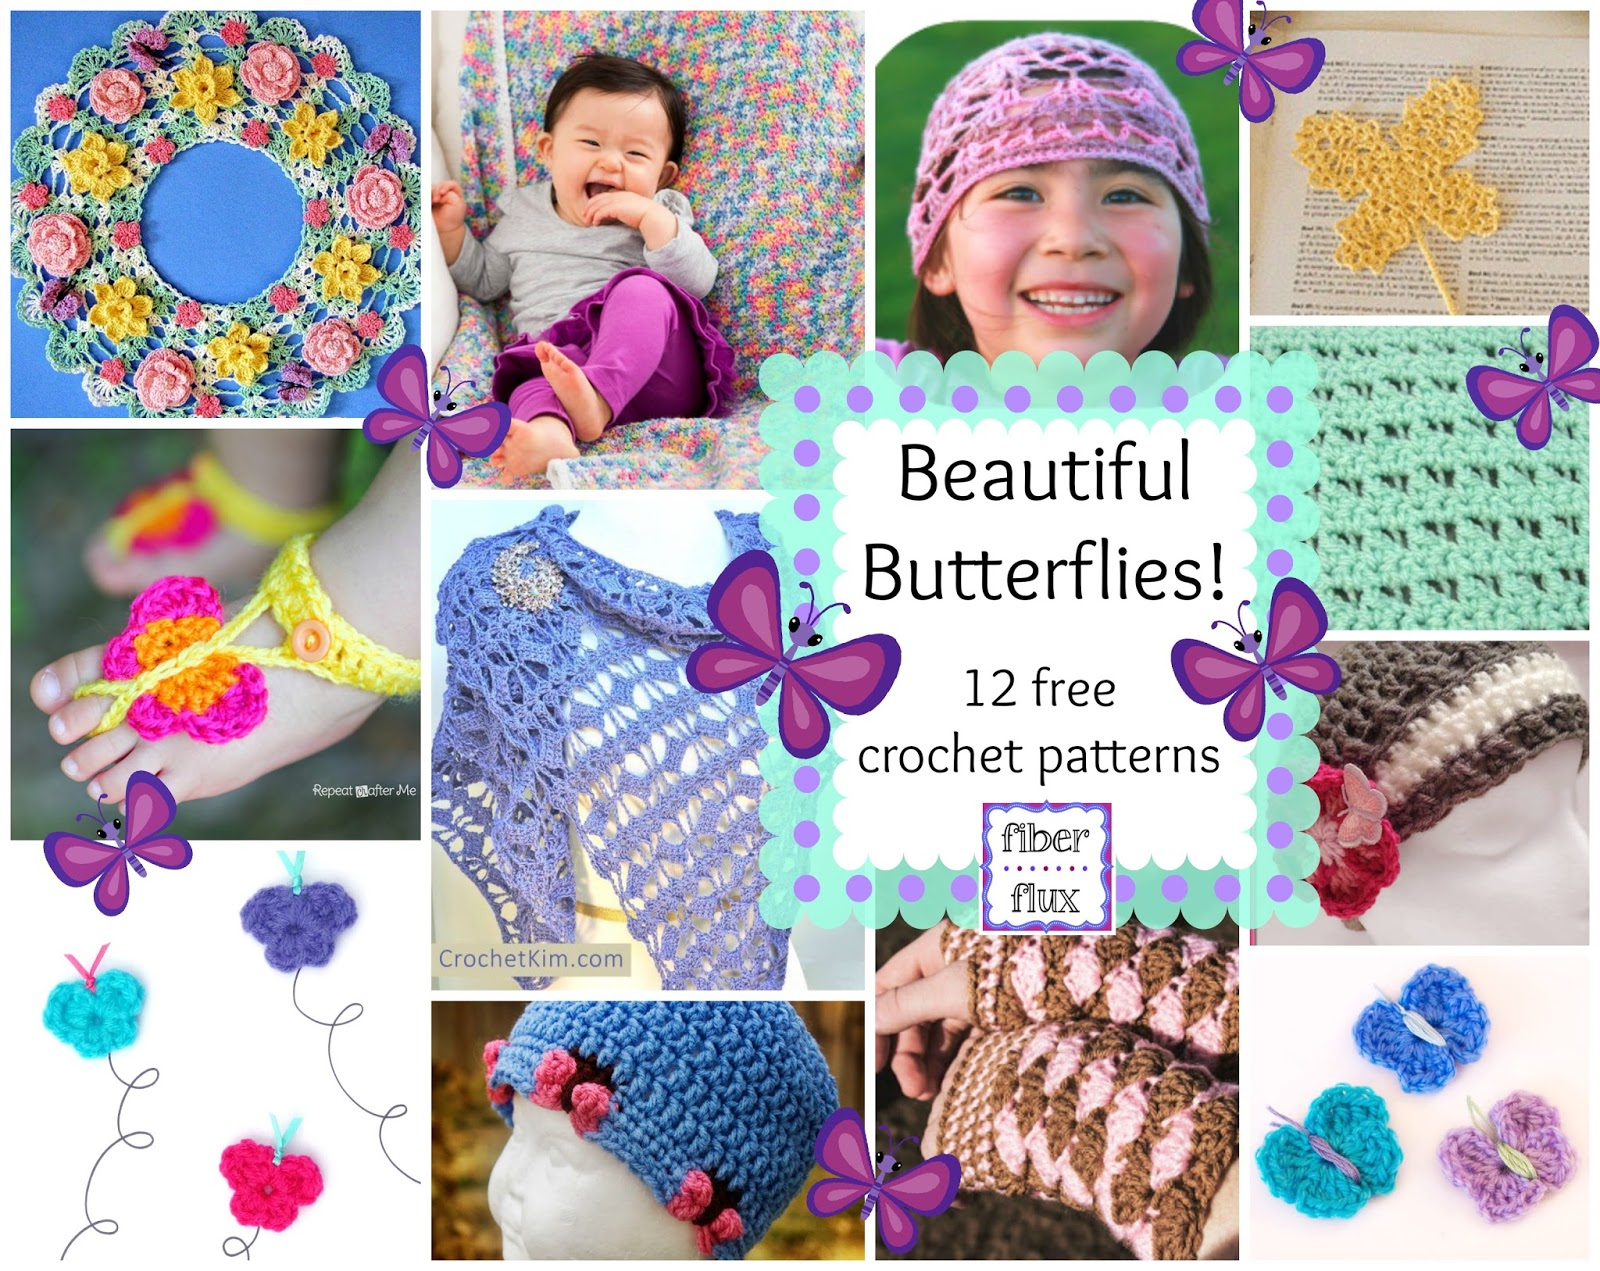 Fiber Flux: Beautiful Butterflies! 12 Free Crochet Patterns...